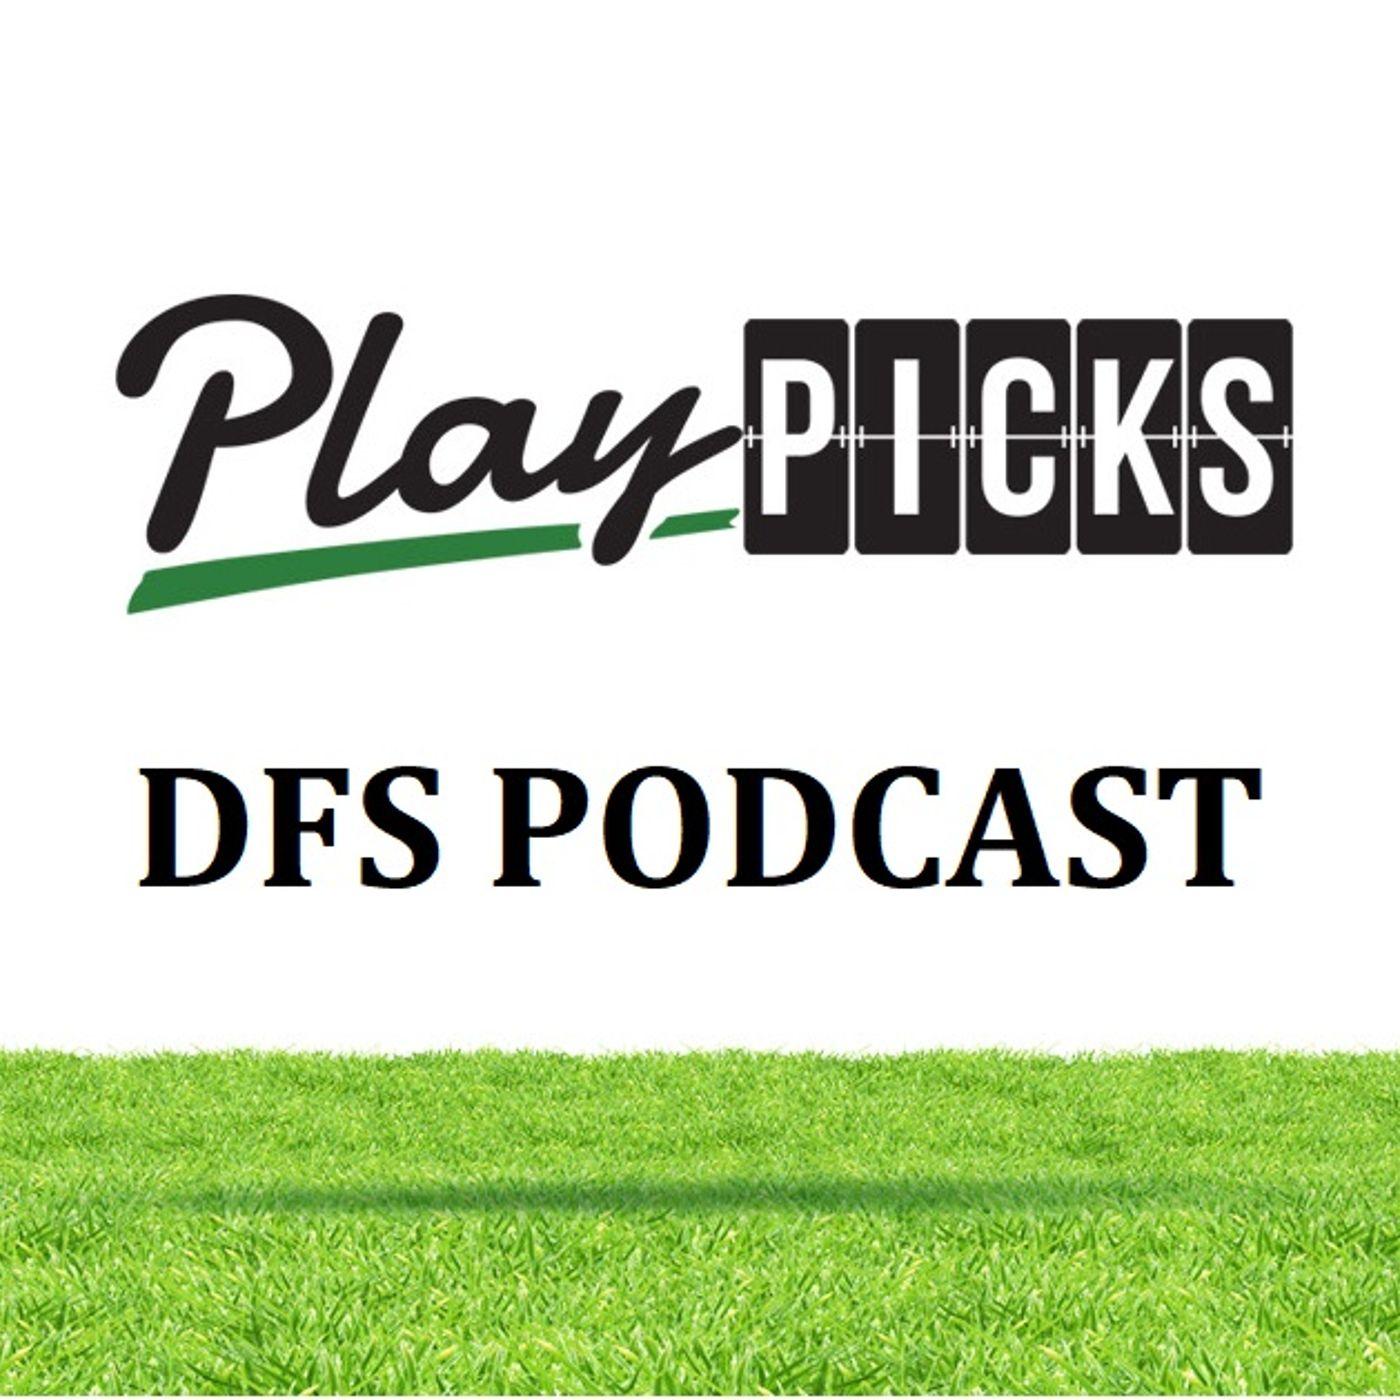 Episode 16: Week 11 DFS Picks, Value Plays & Fades